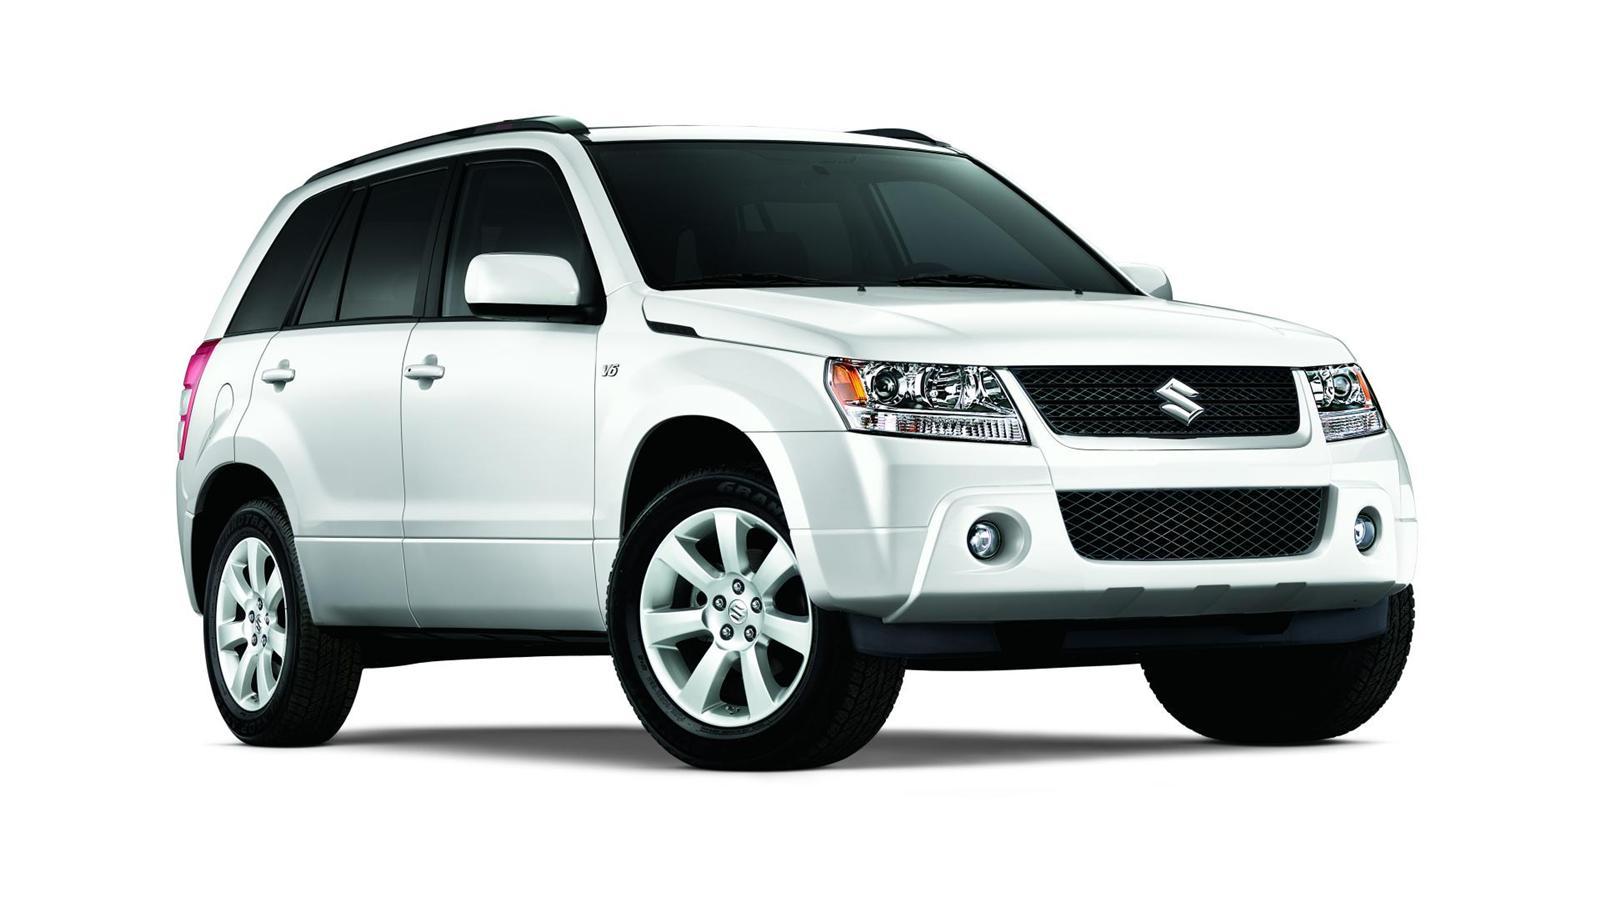 Suzuki grand vitara or similar automatic